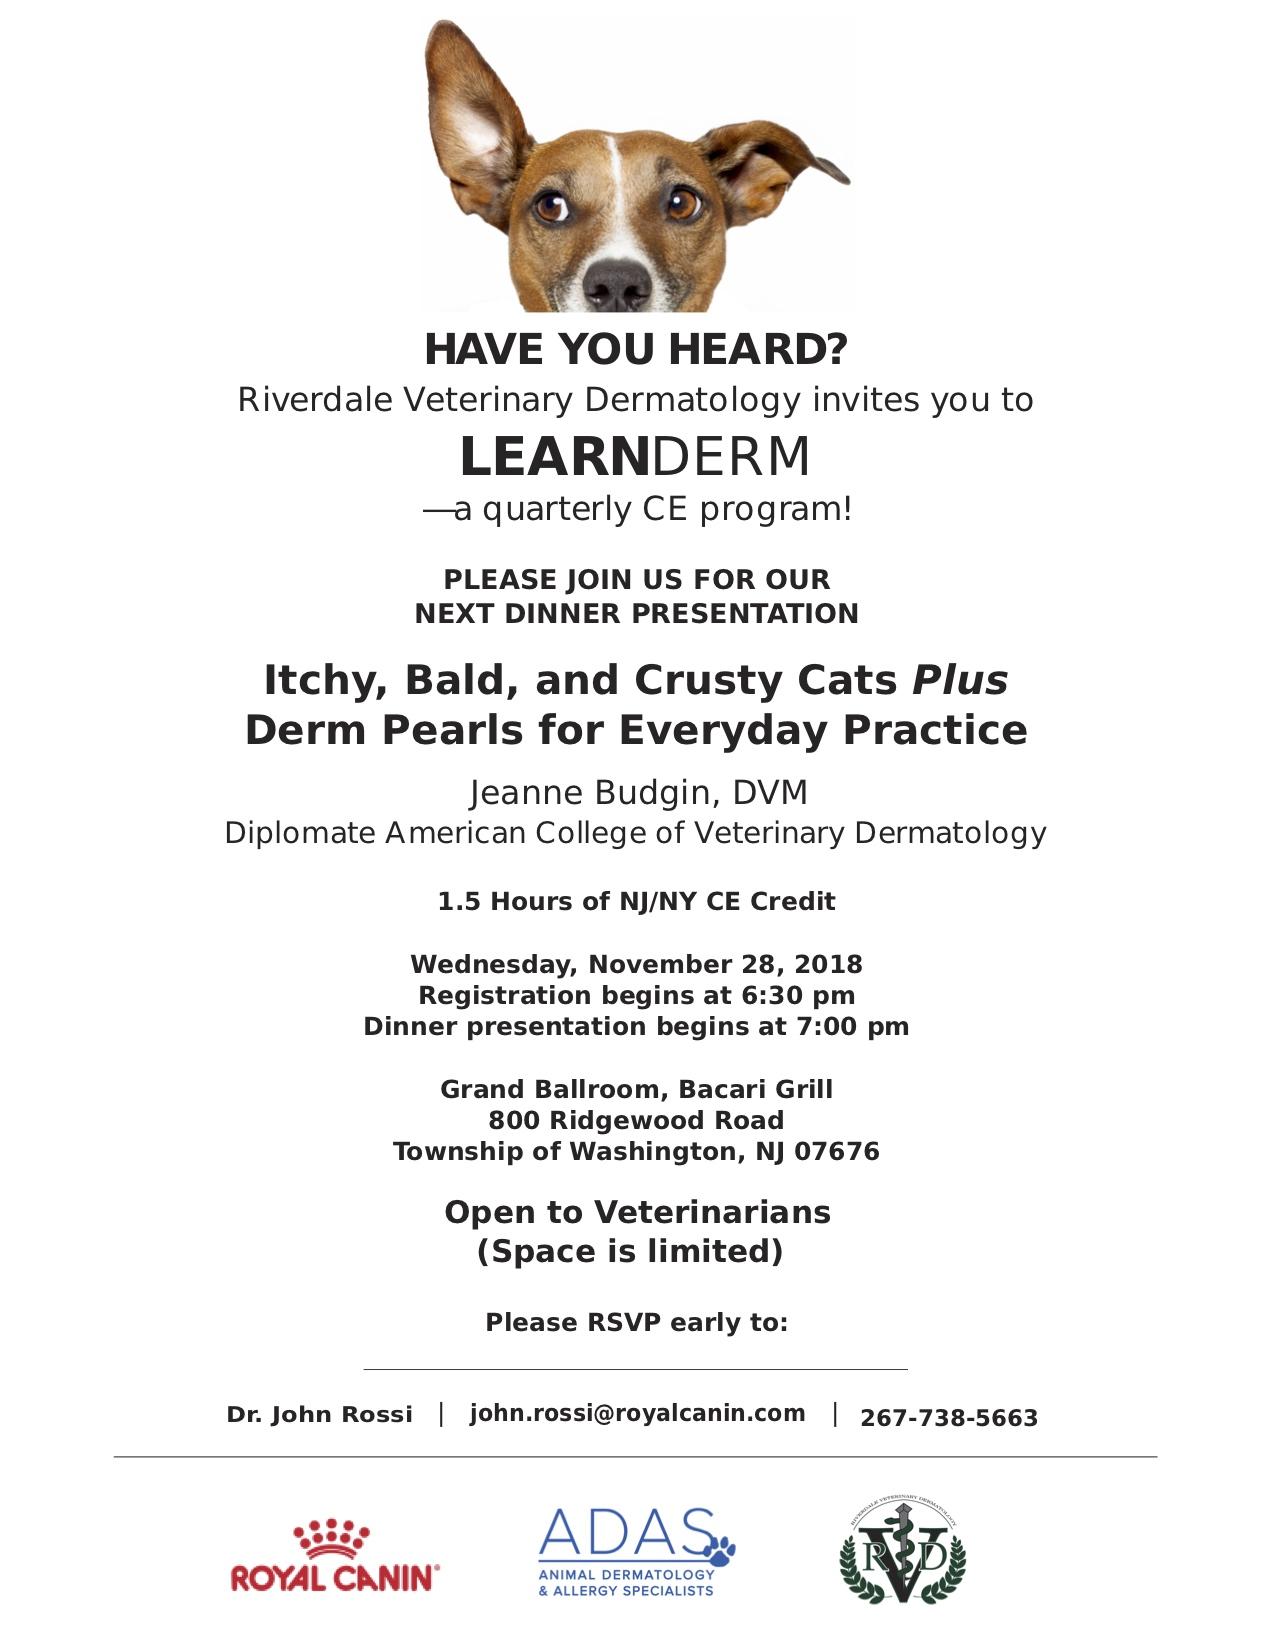 LearnDerm 11.28.18 invite.jpg